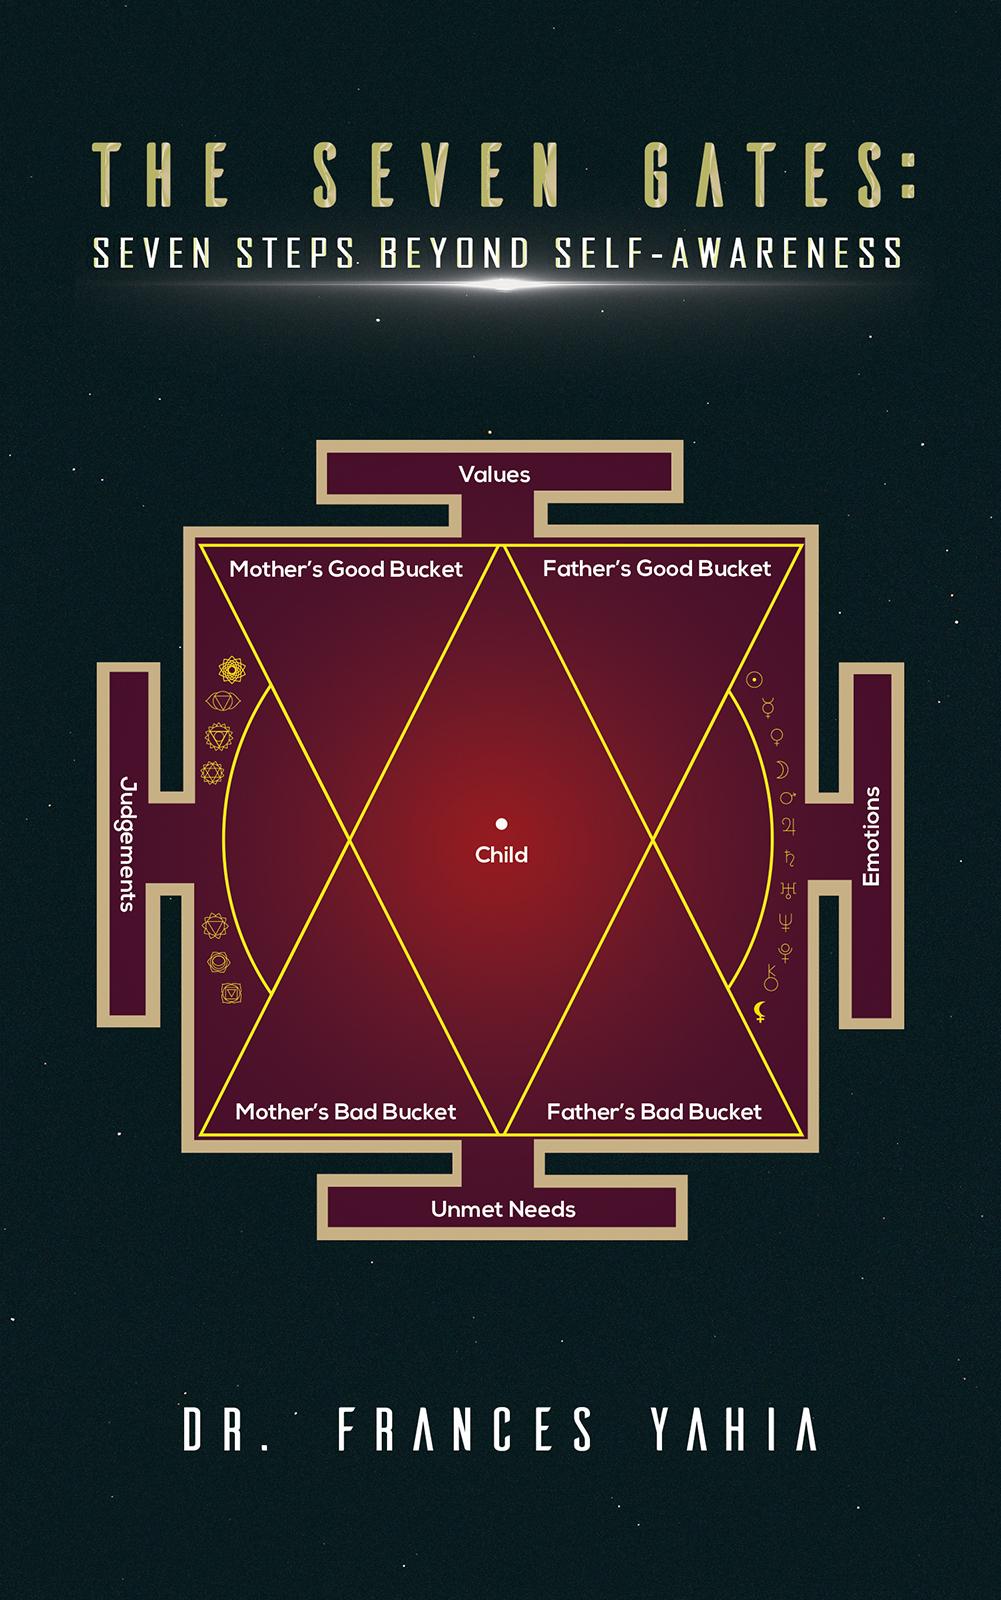 The Seven Gates: Seven Steps Beyond Self-Awareness | Book